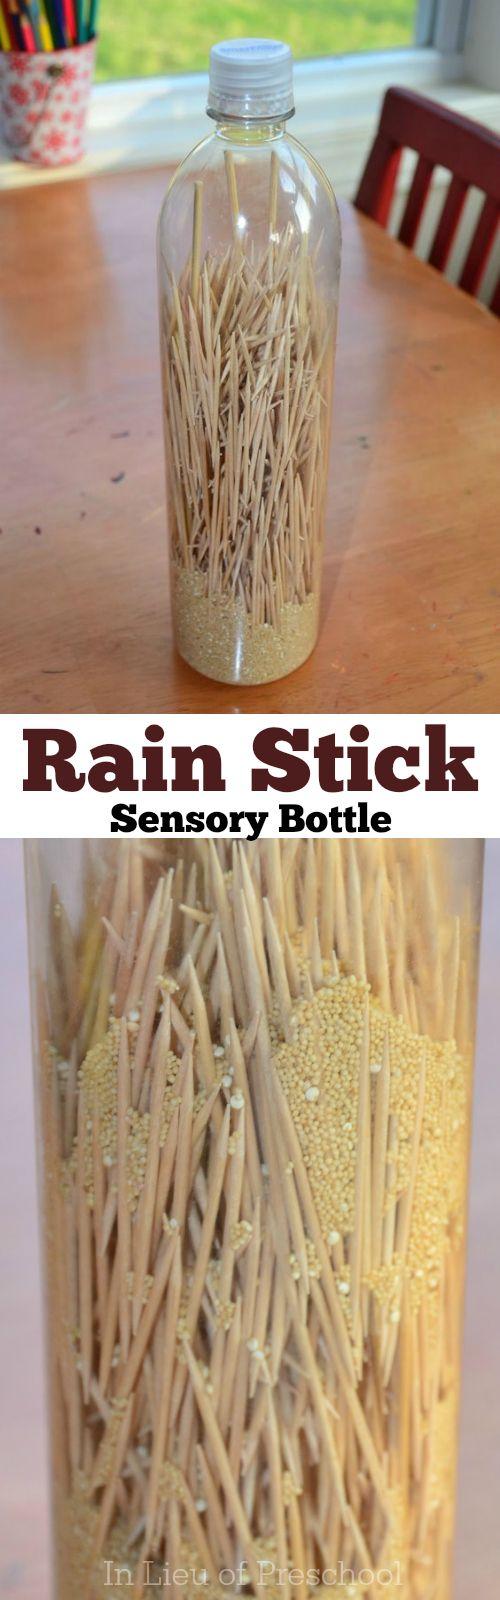 rain stick sensory bottle